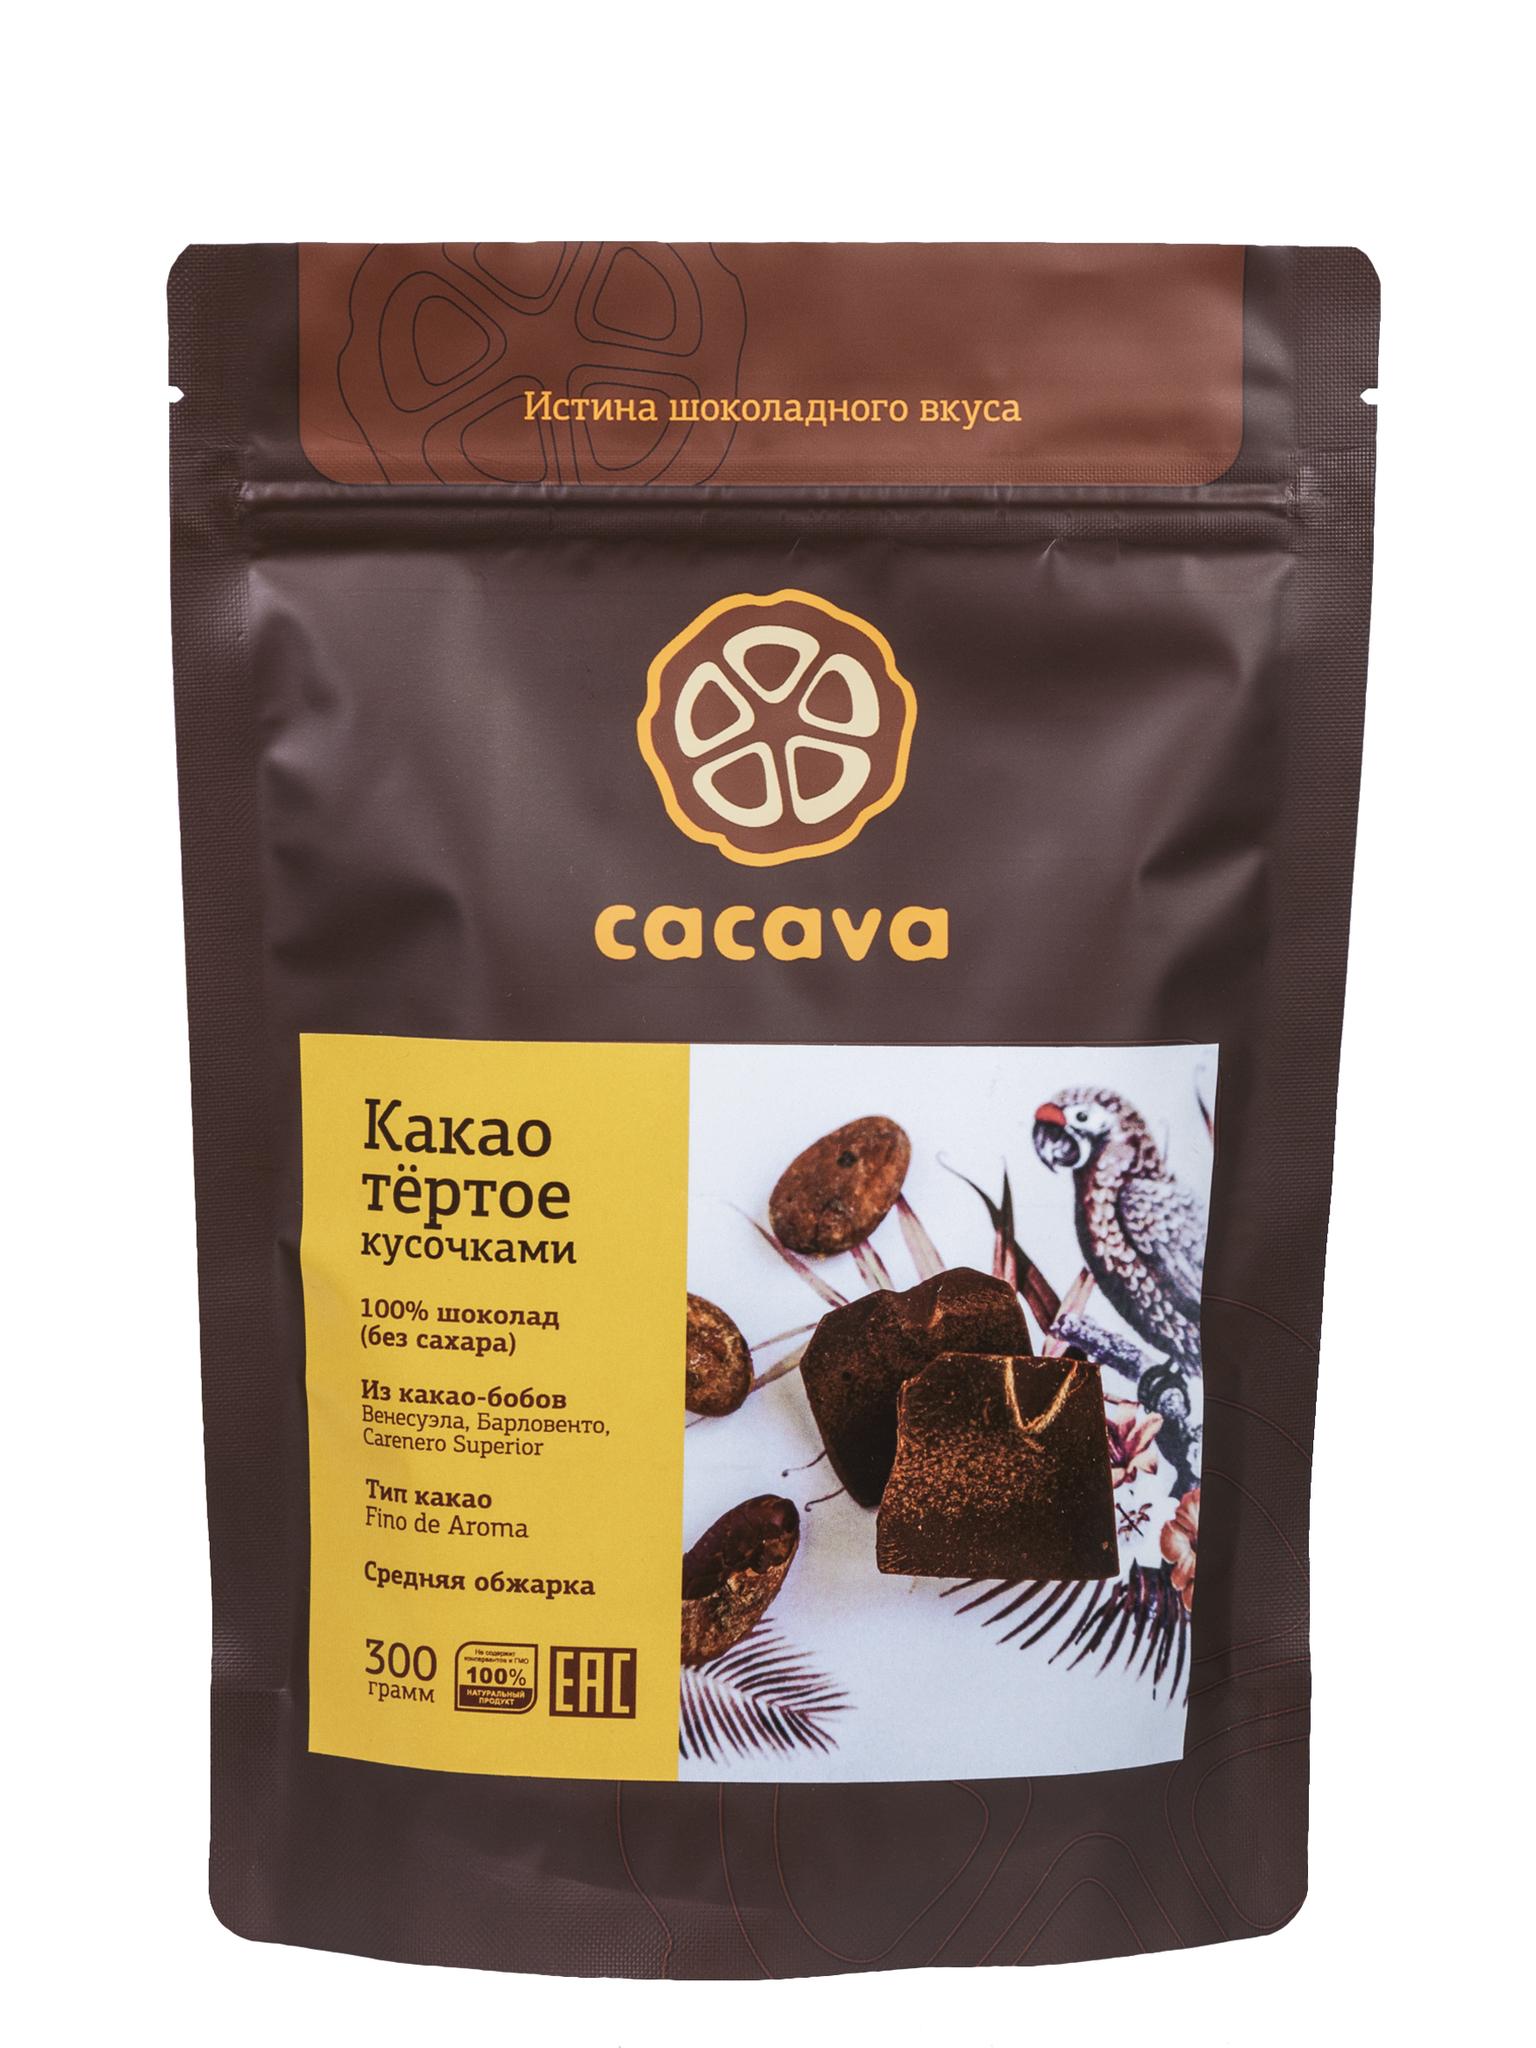 Какао тёртое кусочками (Венесуэла), упаковка 300 грамм